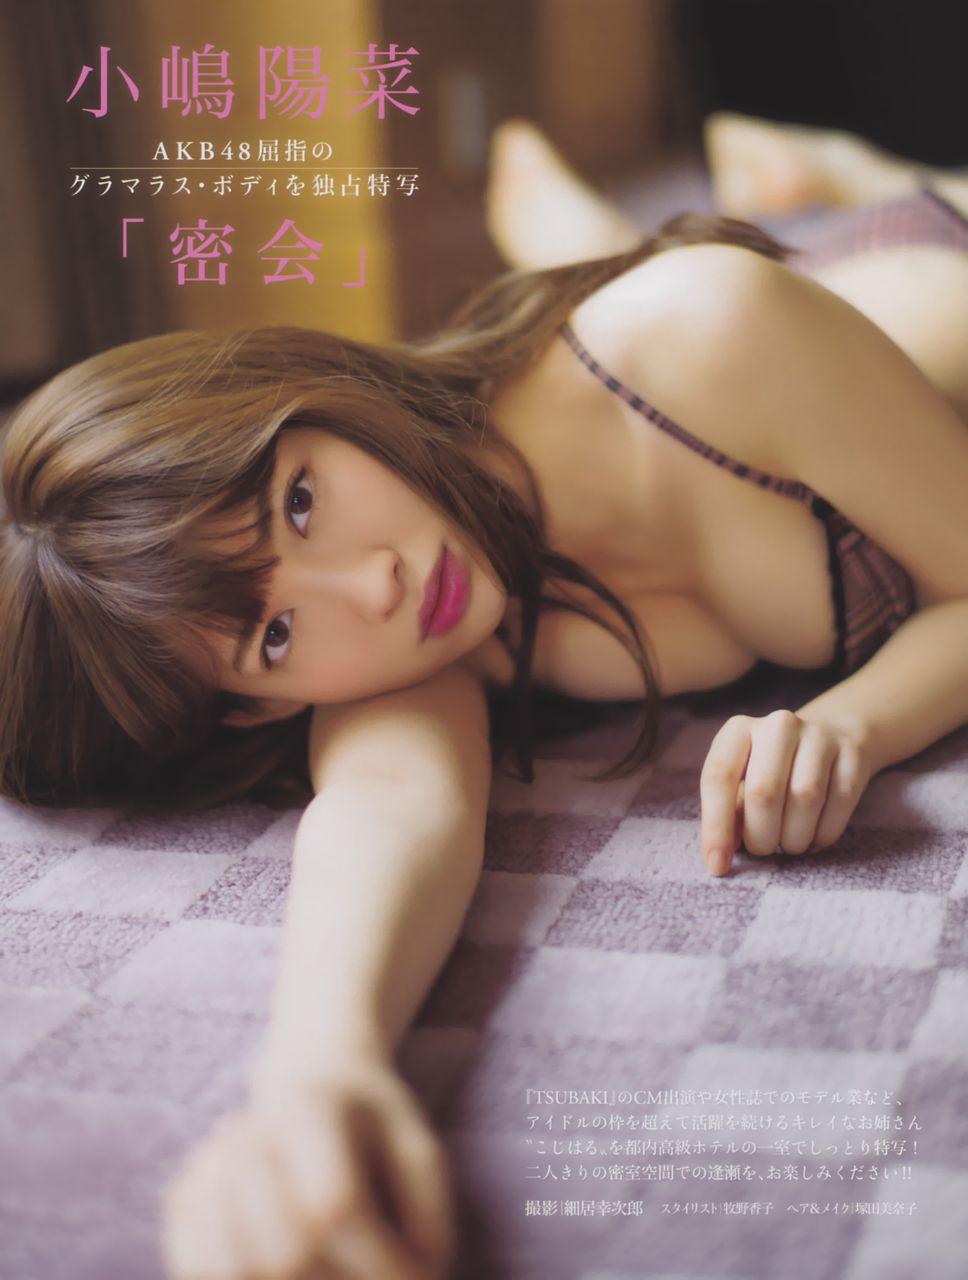 AKB48 チームB 小嶋陽菜